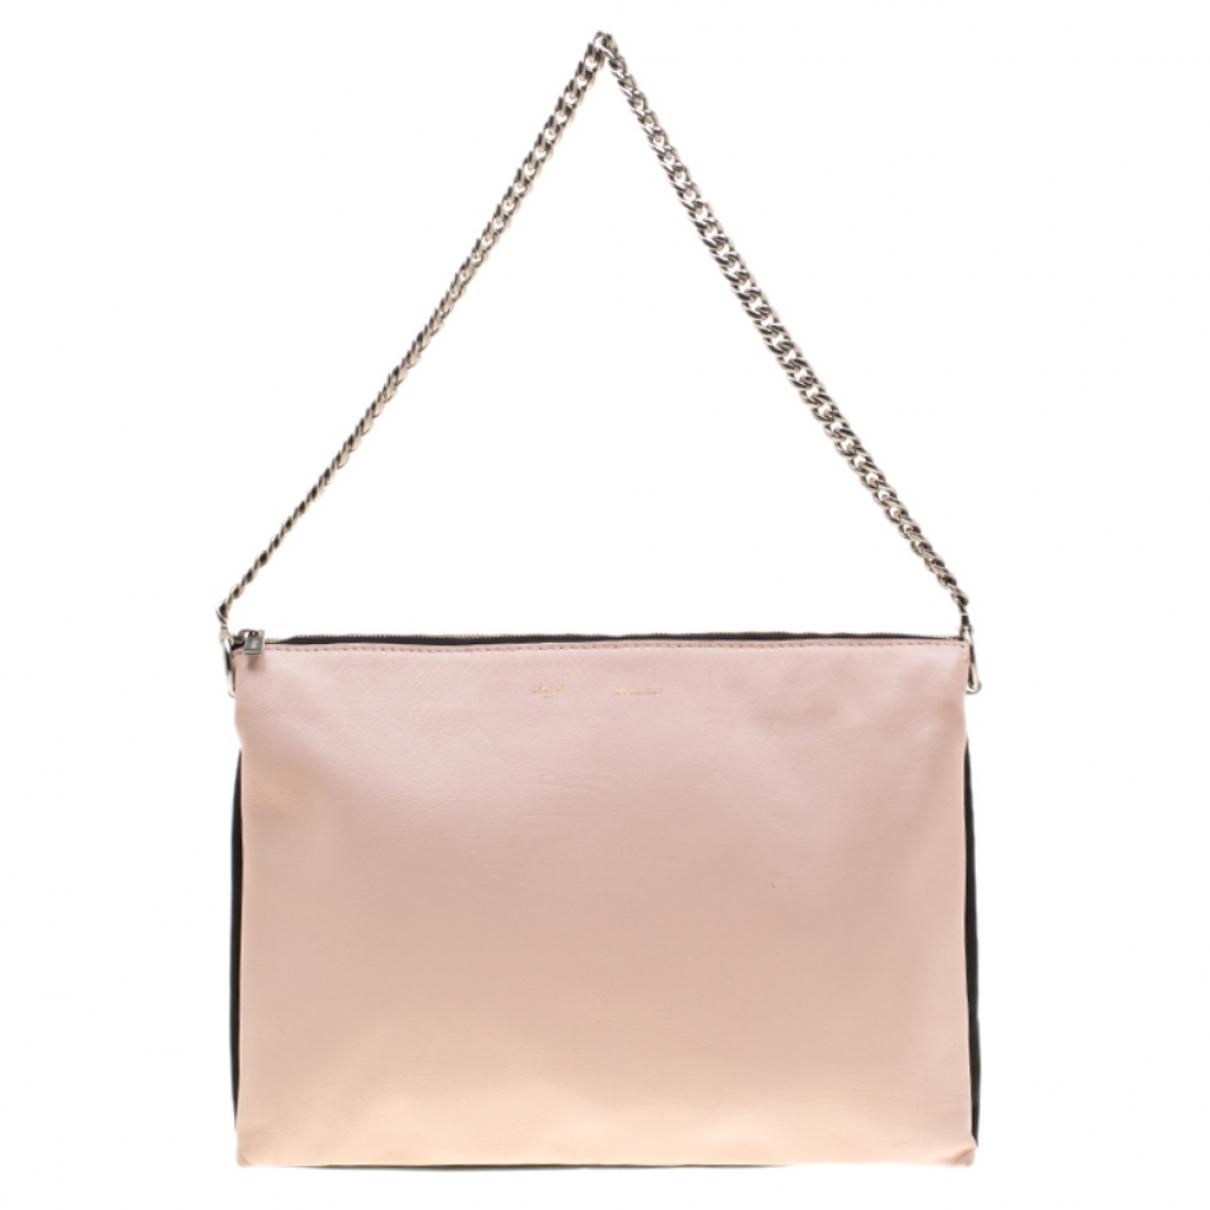 Celine \N Beige Leather Clutch bag for Women \N